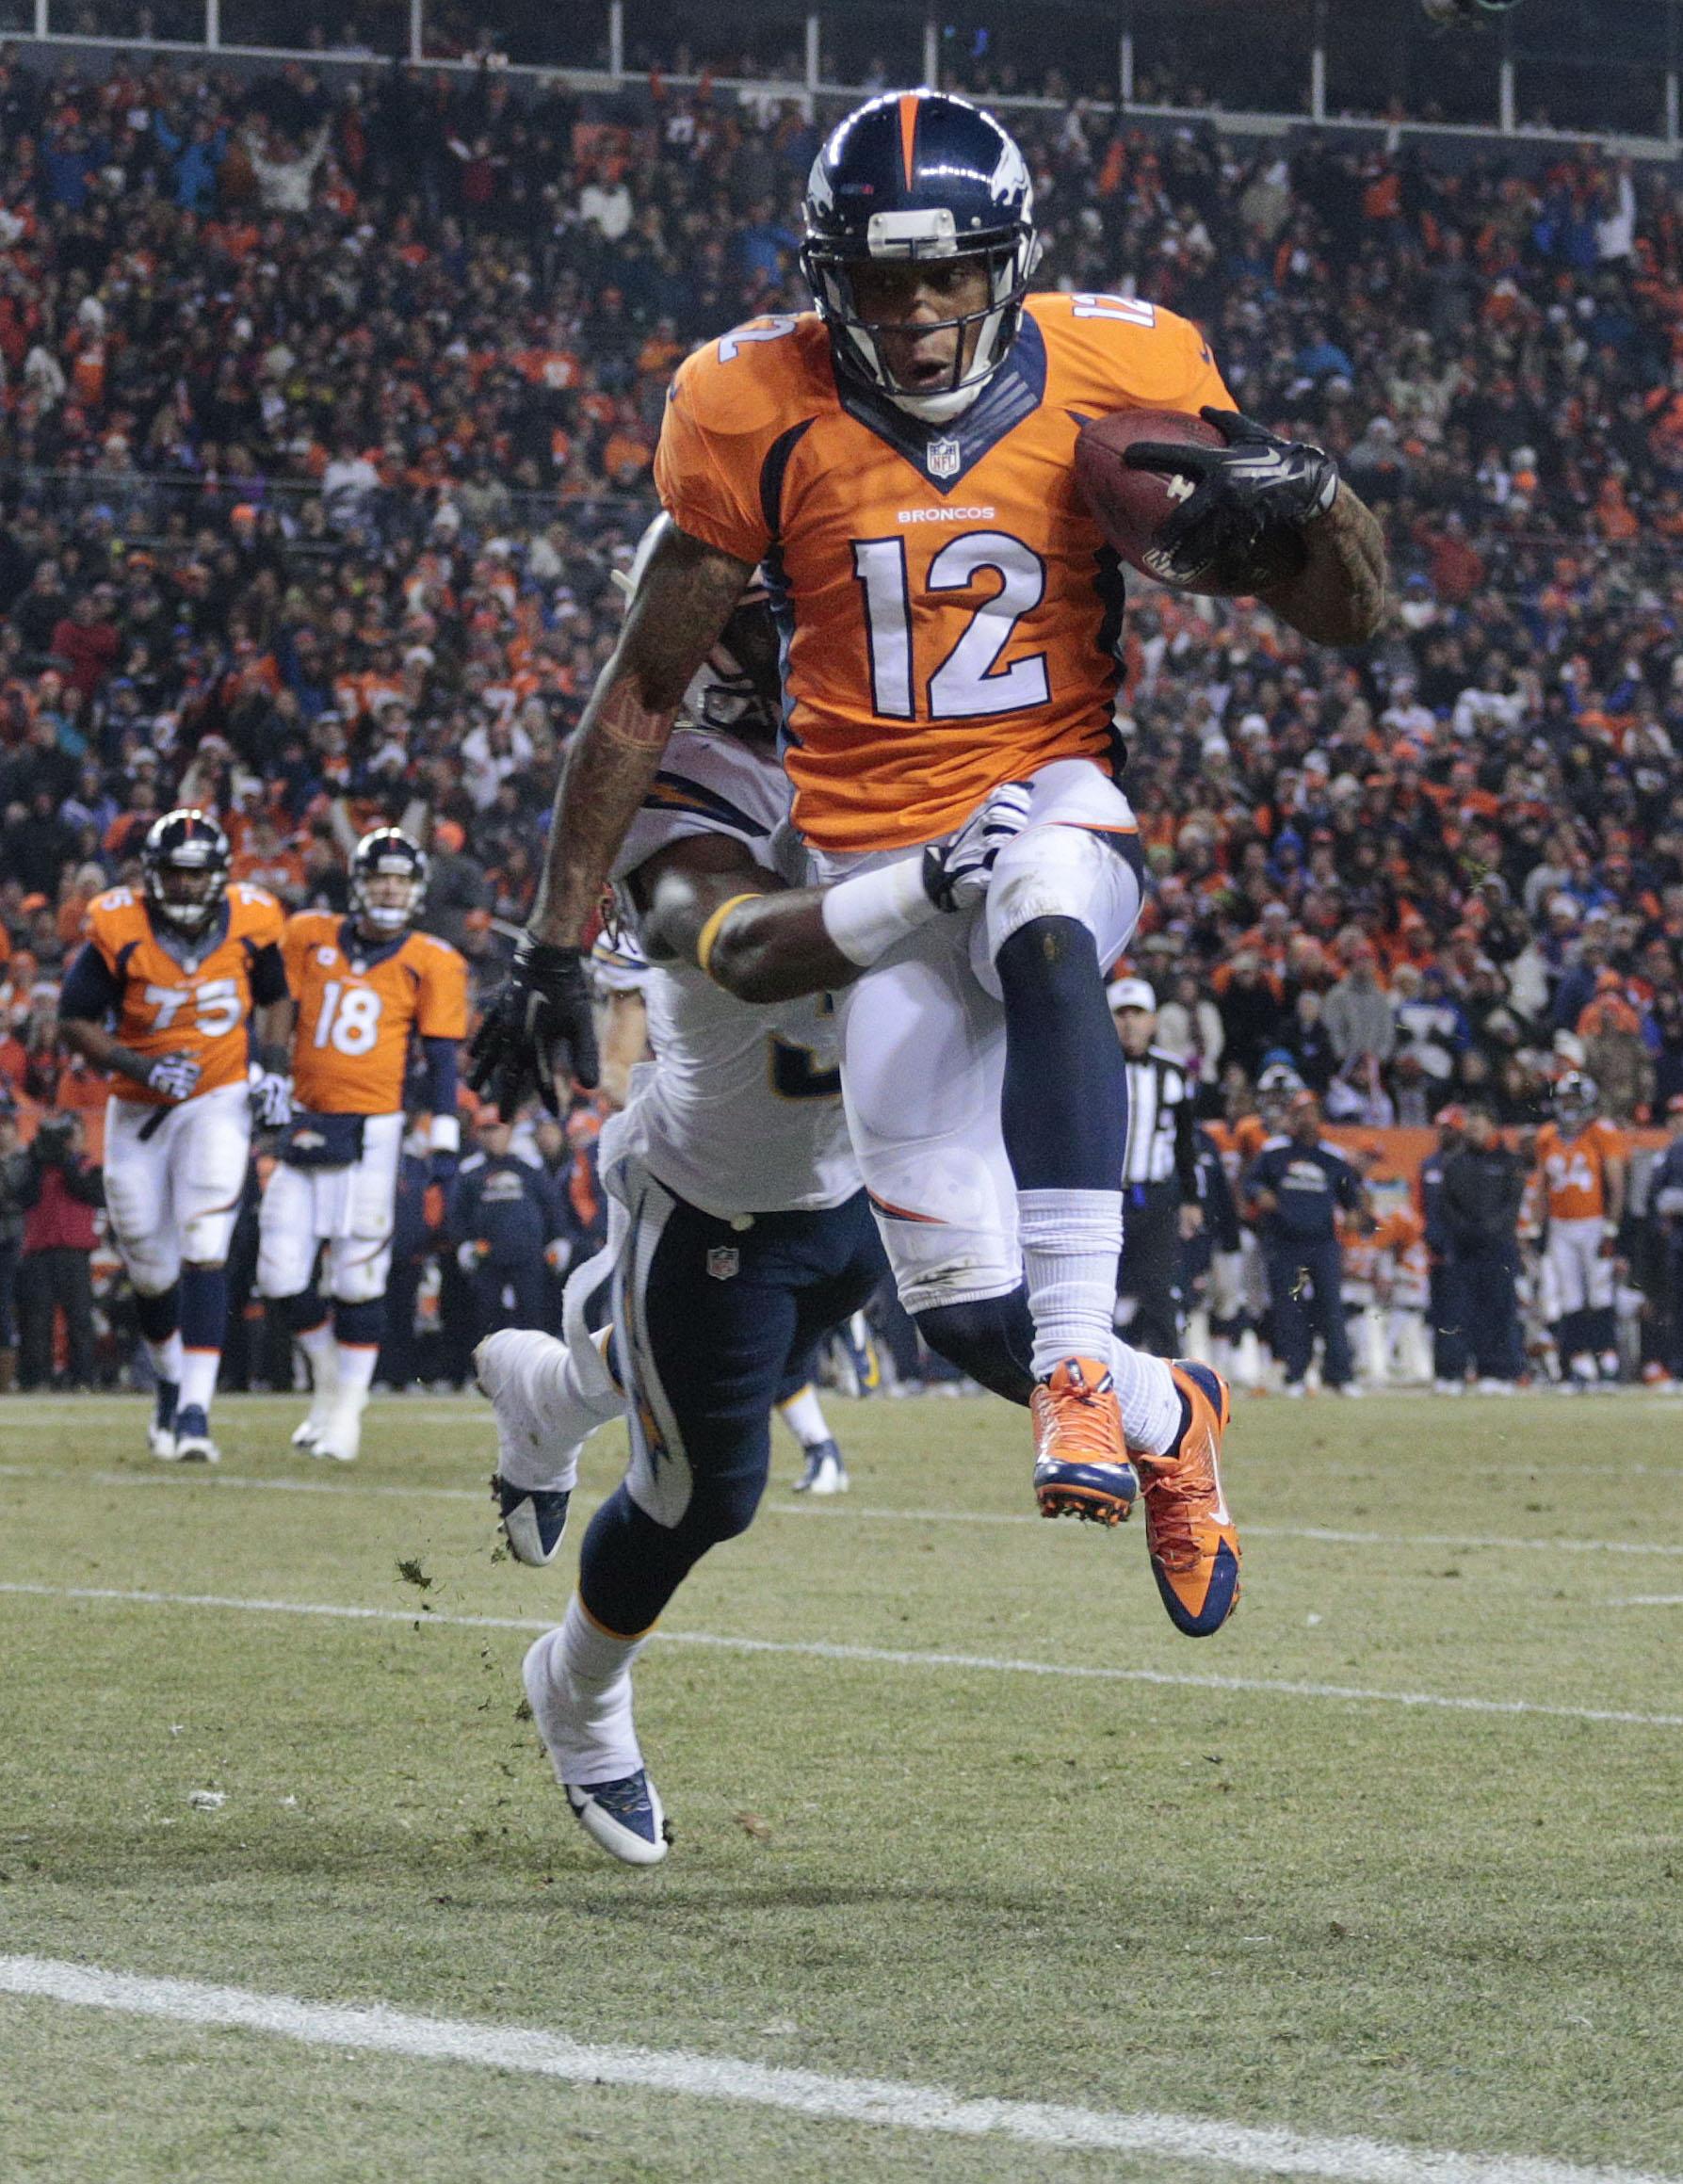 Broncos' loss opens door in AFC playoff race